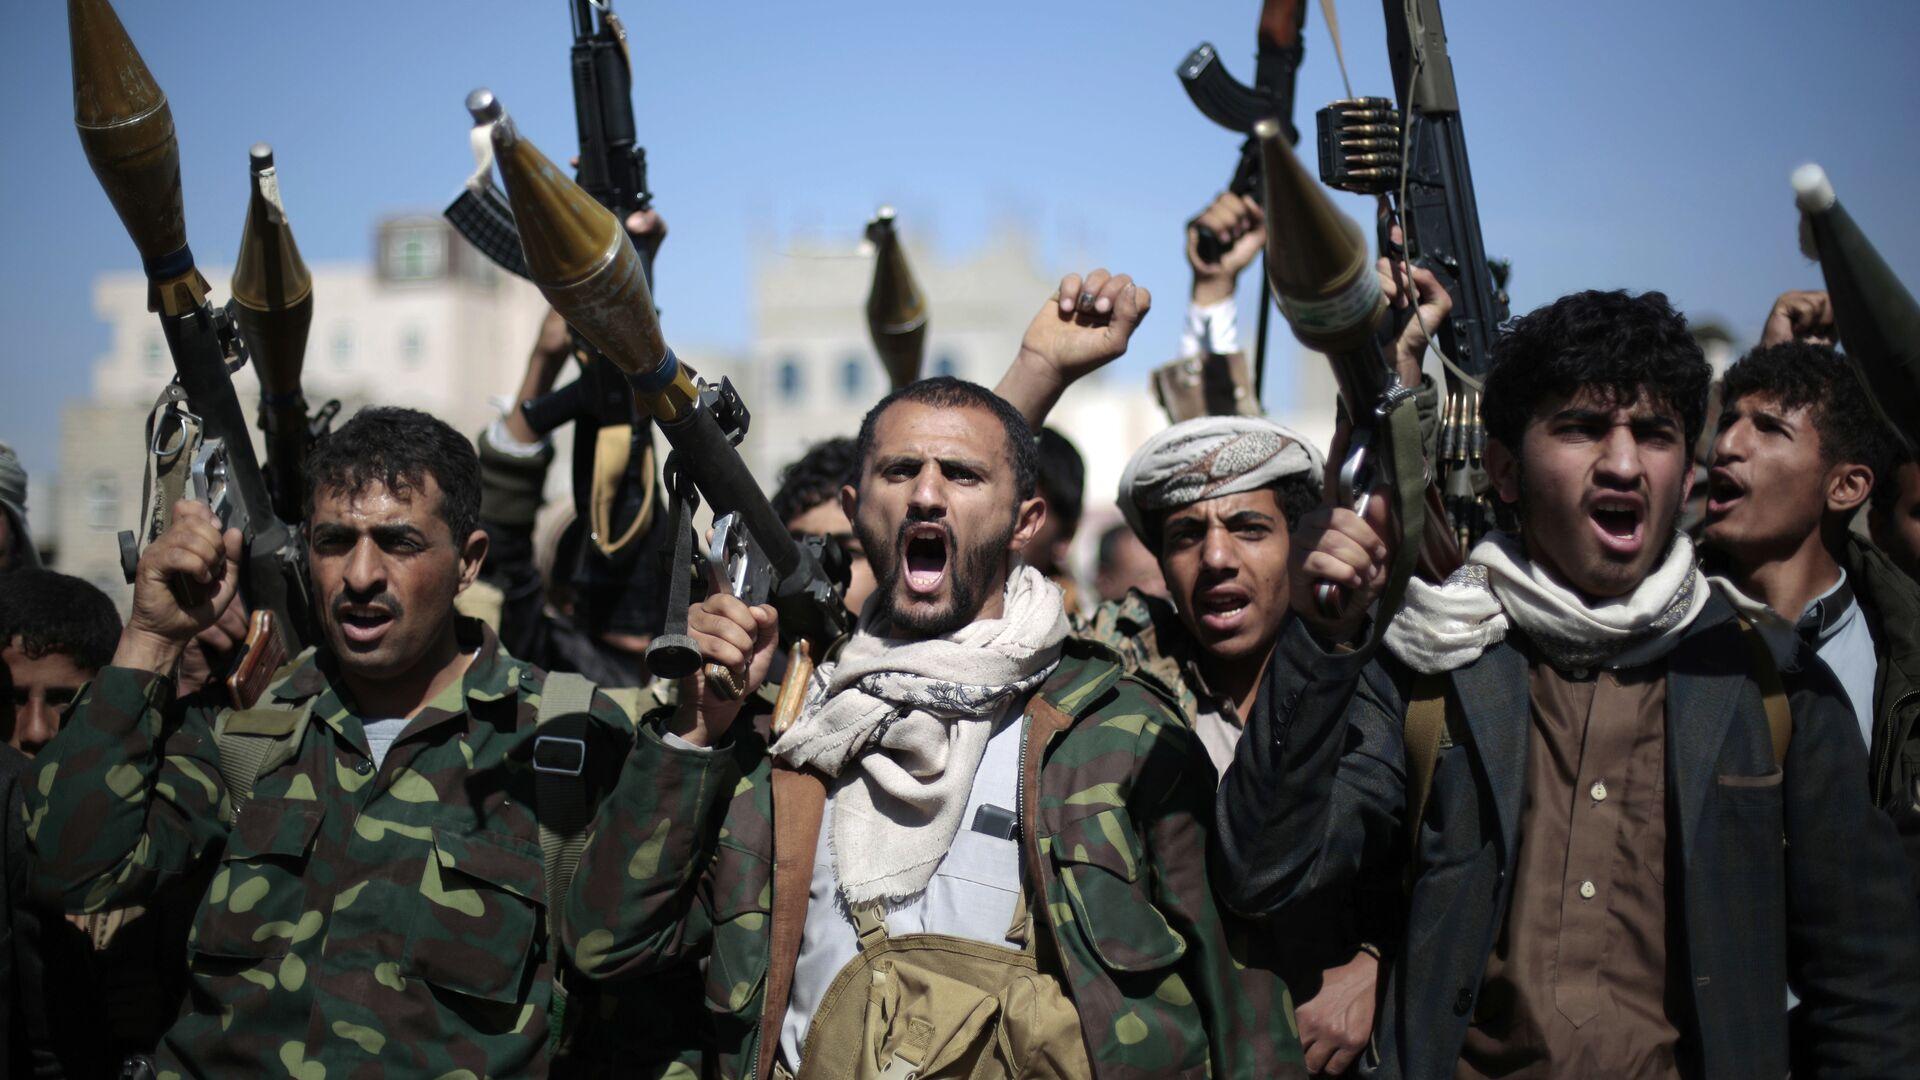 Rebeldes hutíes en Yemen (archivo) - Sputnik Mundo, 1920, 21.04.2021